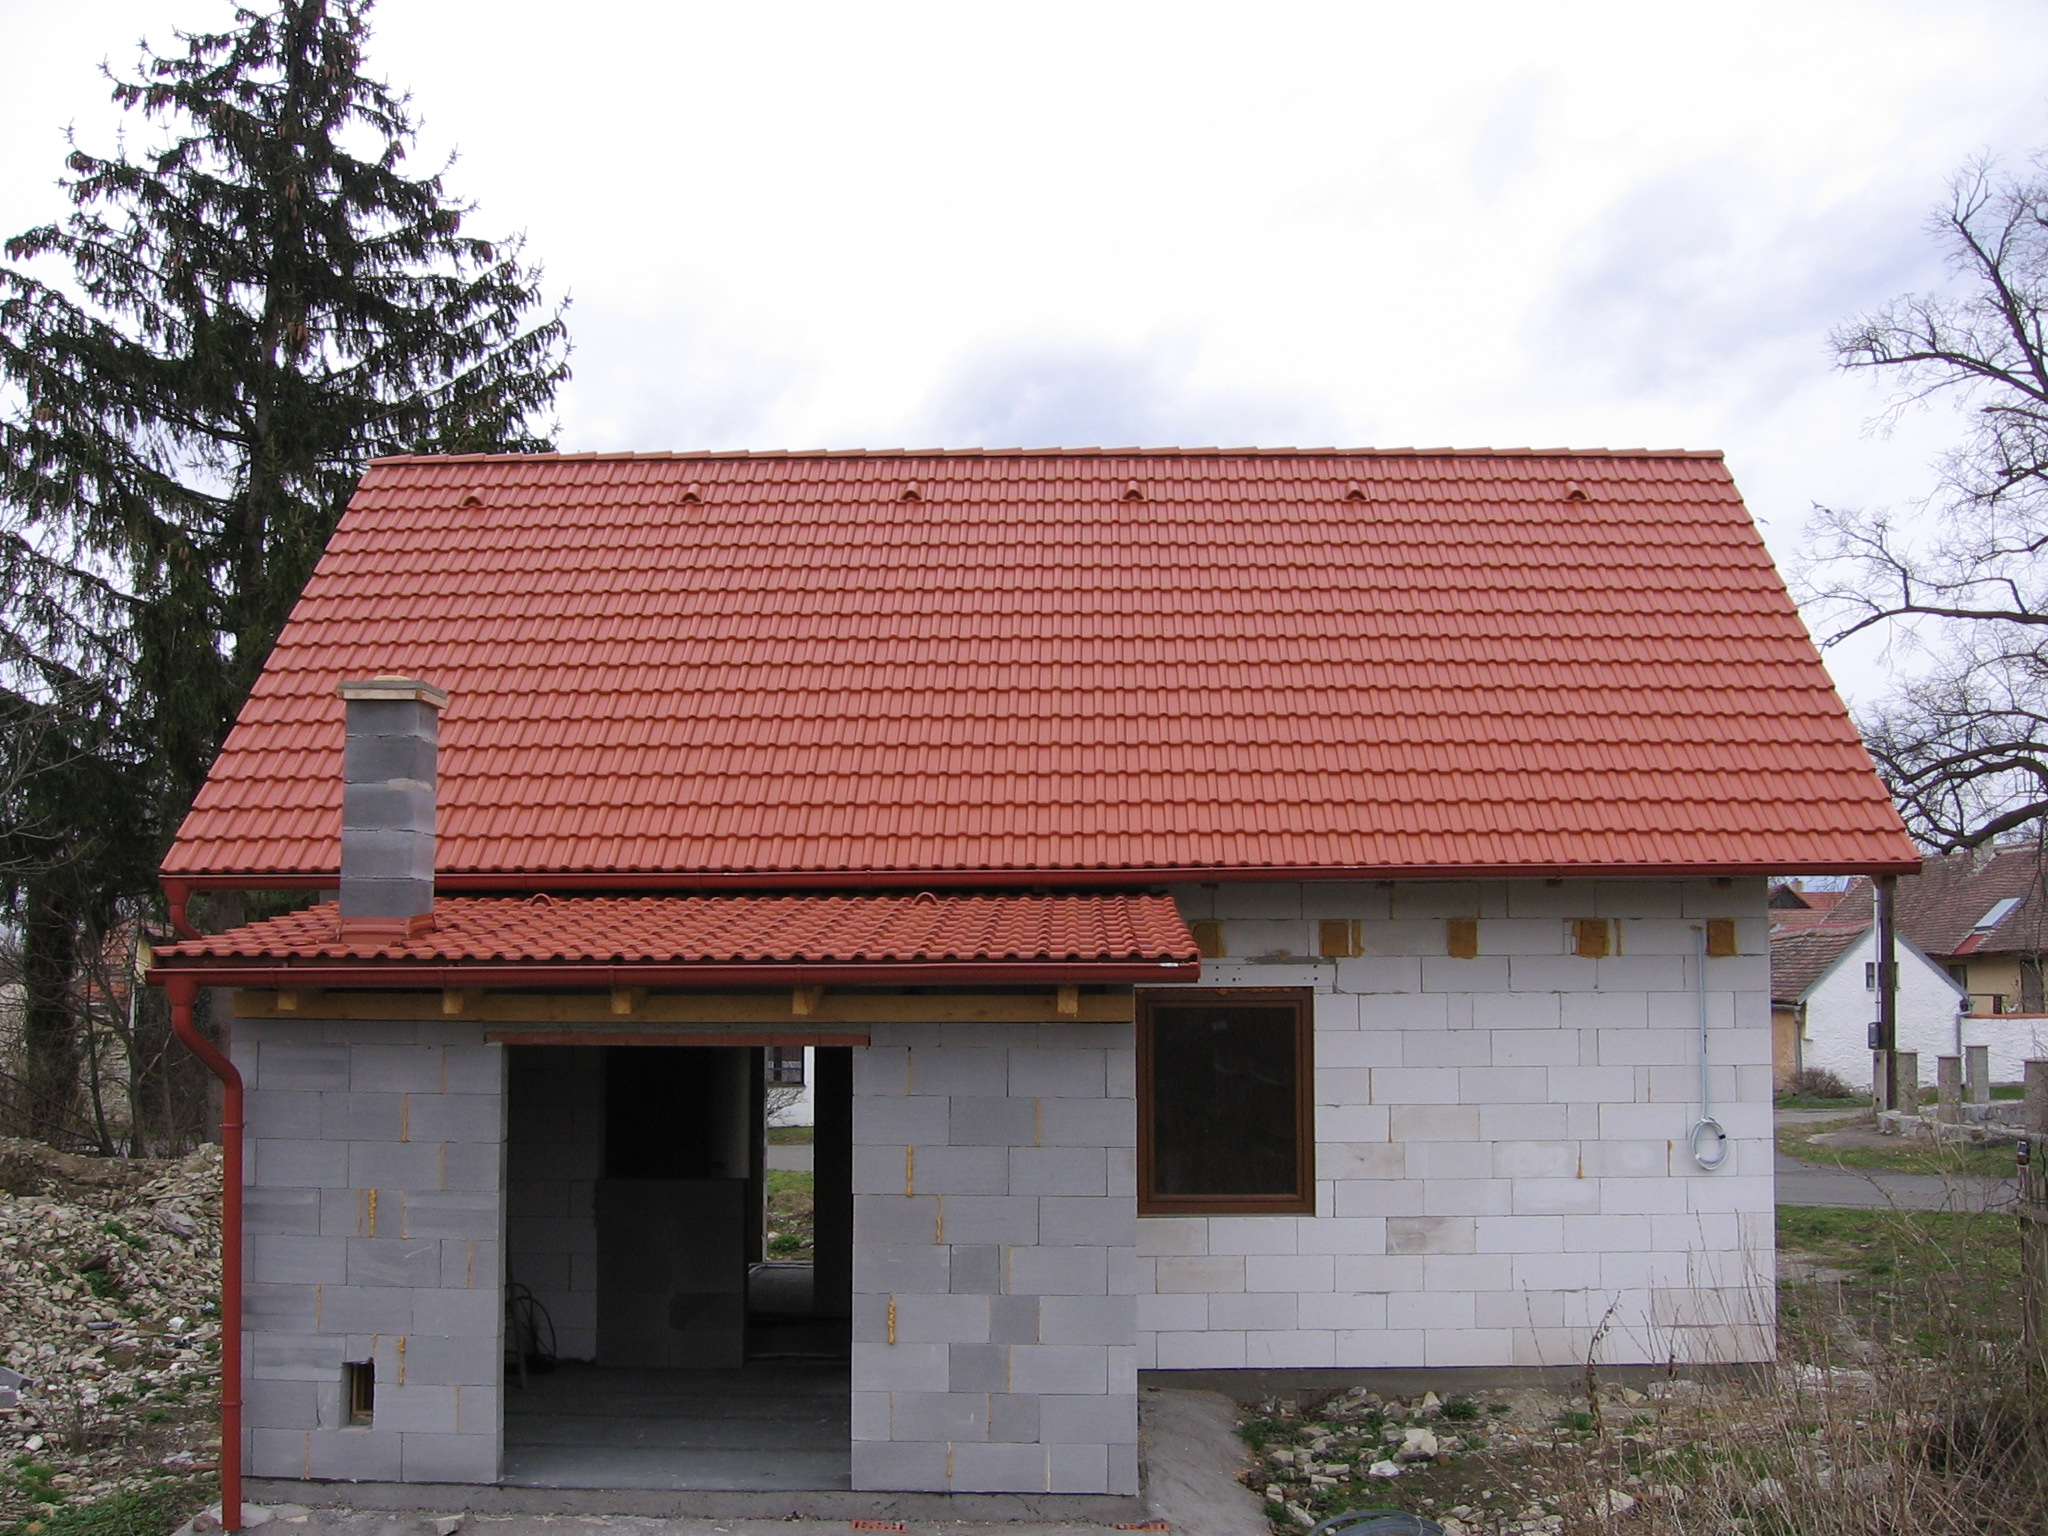 betonovc3a1-krytina-km-beta3